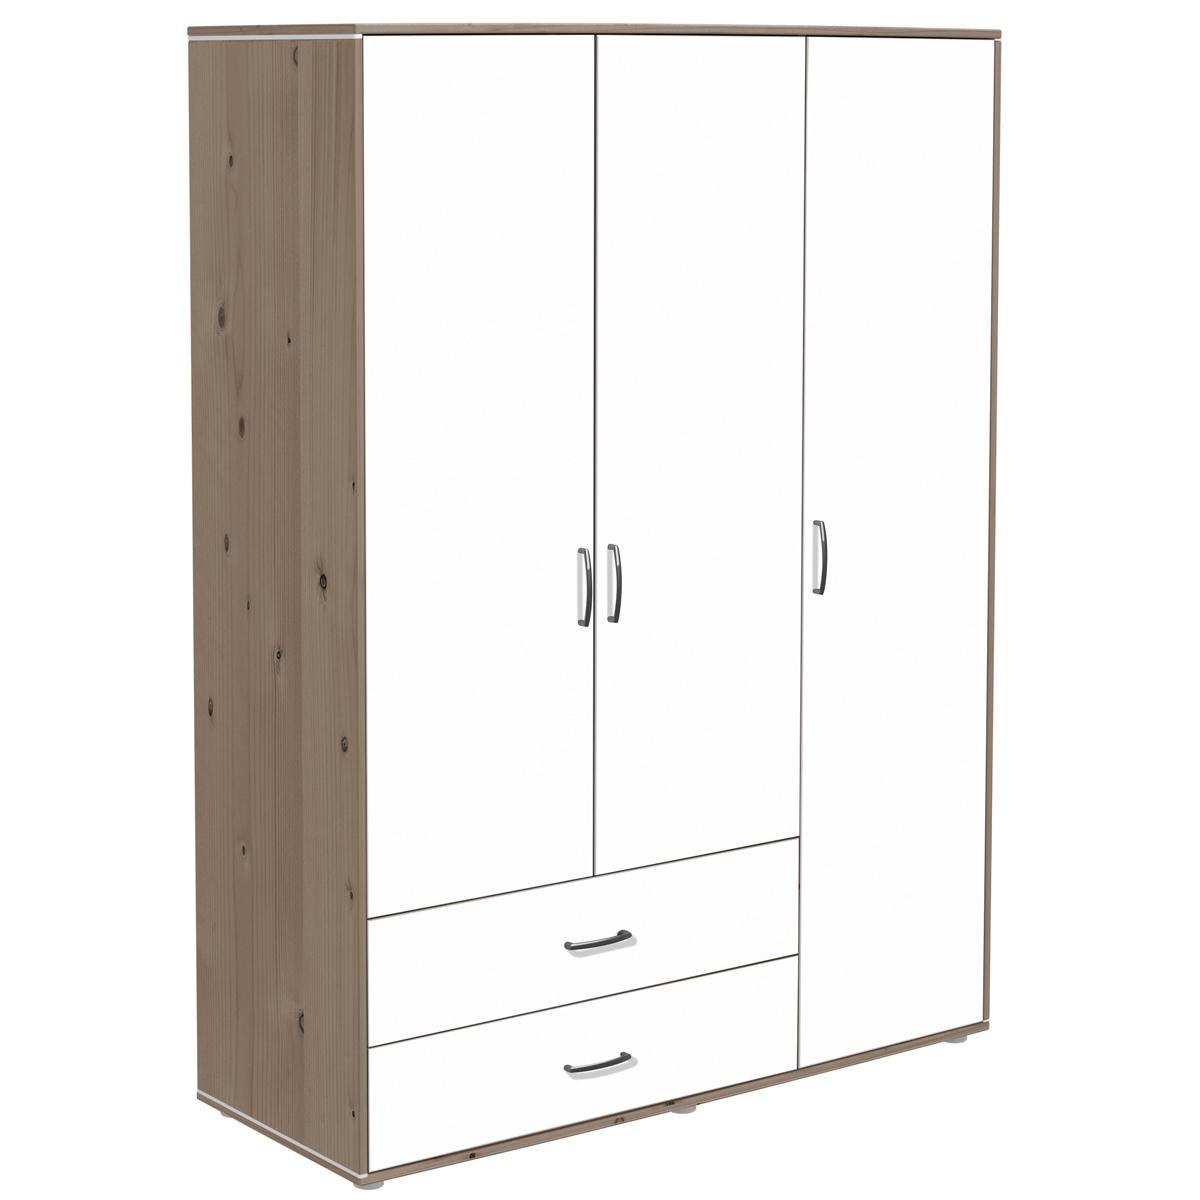 Armoire enfant 3 portes/2 tiroirs/4 tablettes terra/blanc FLEXA